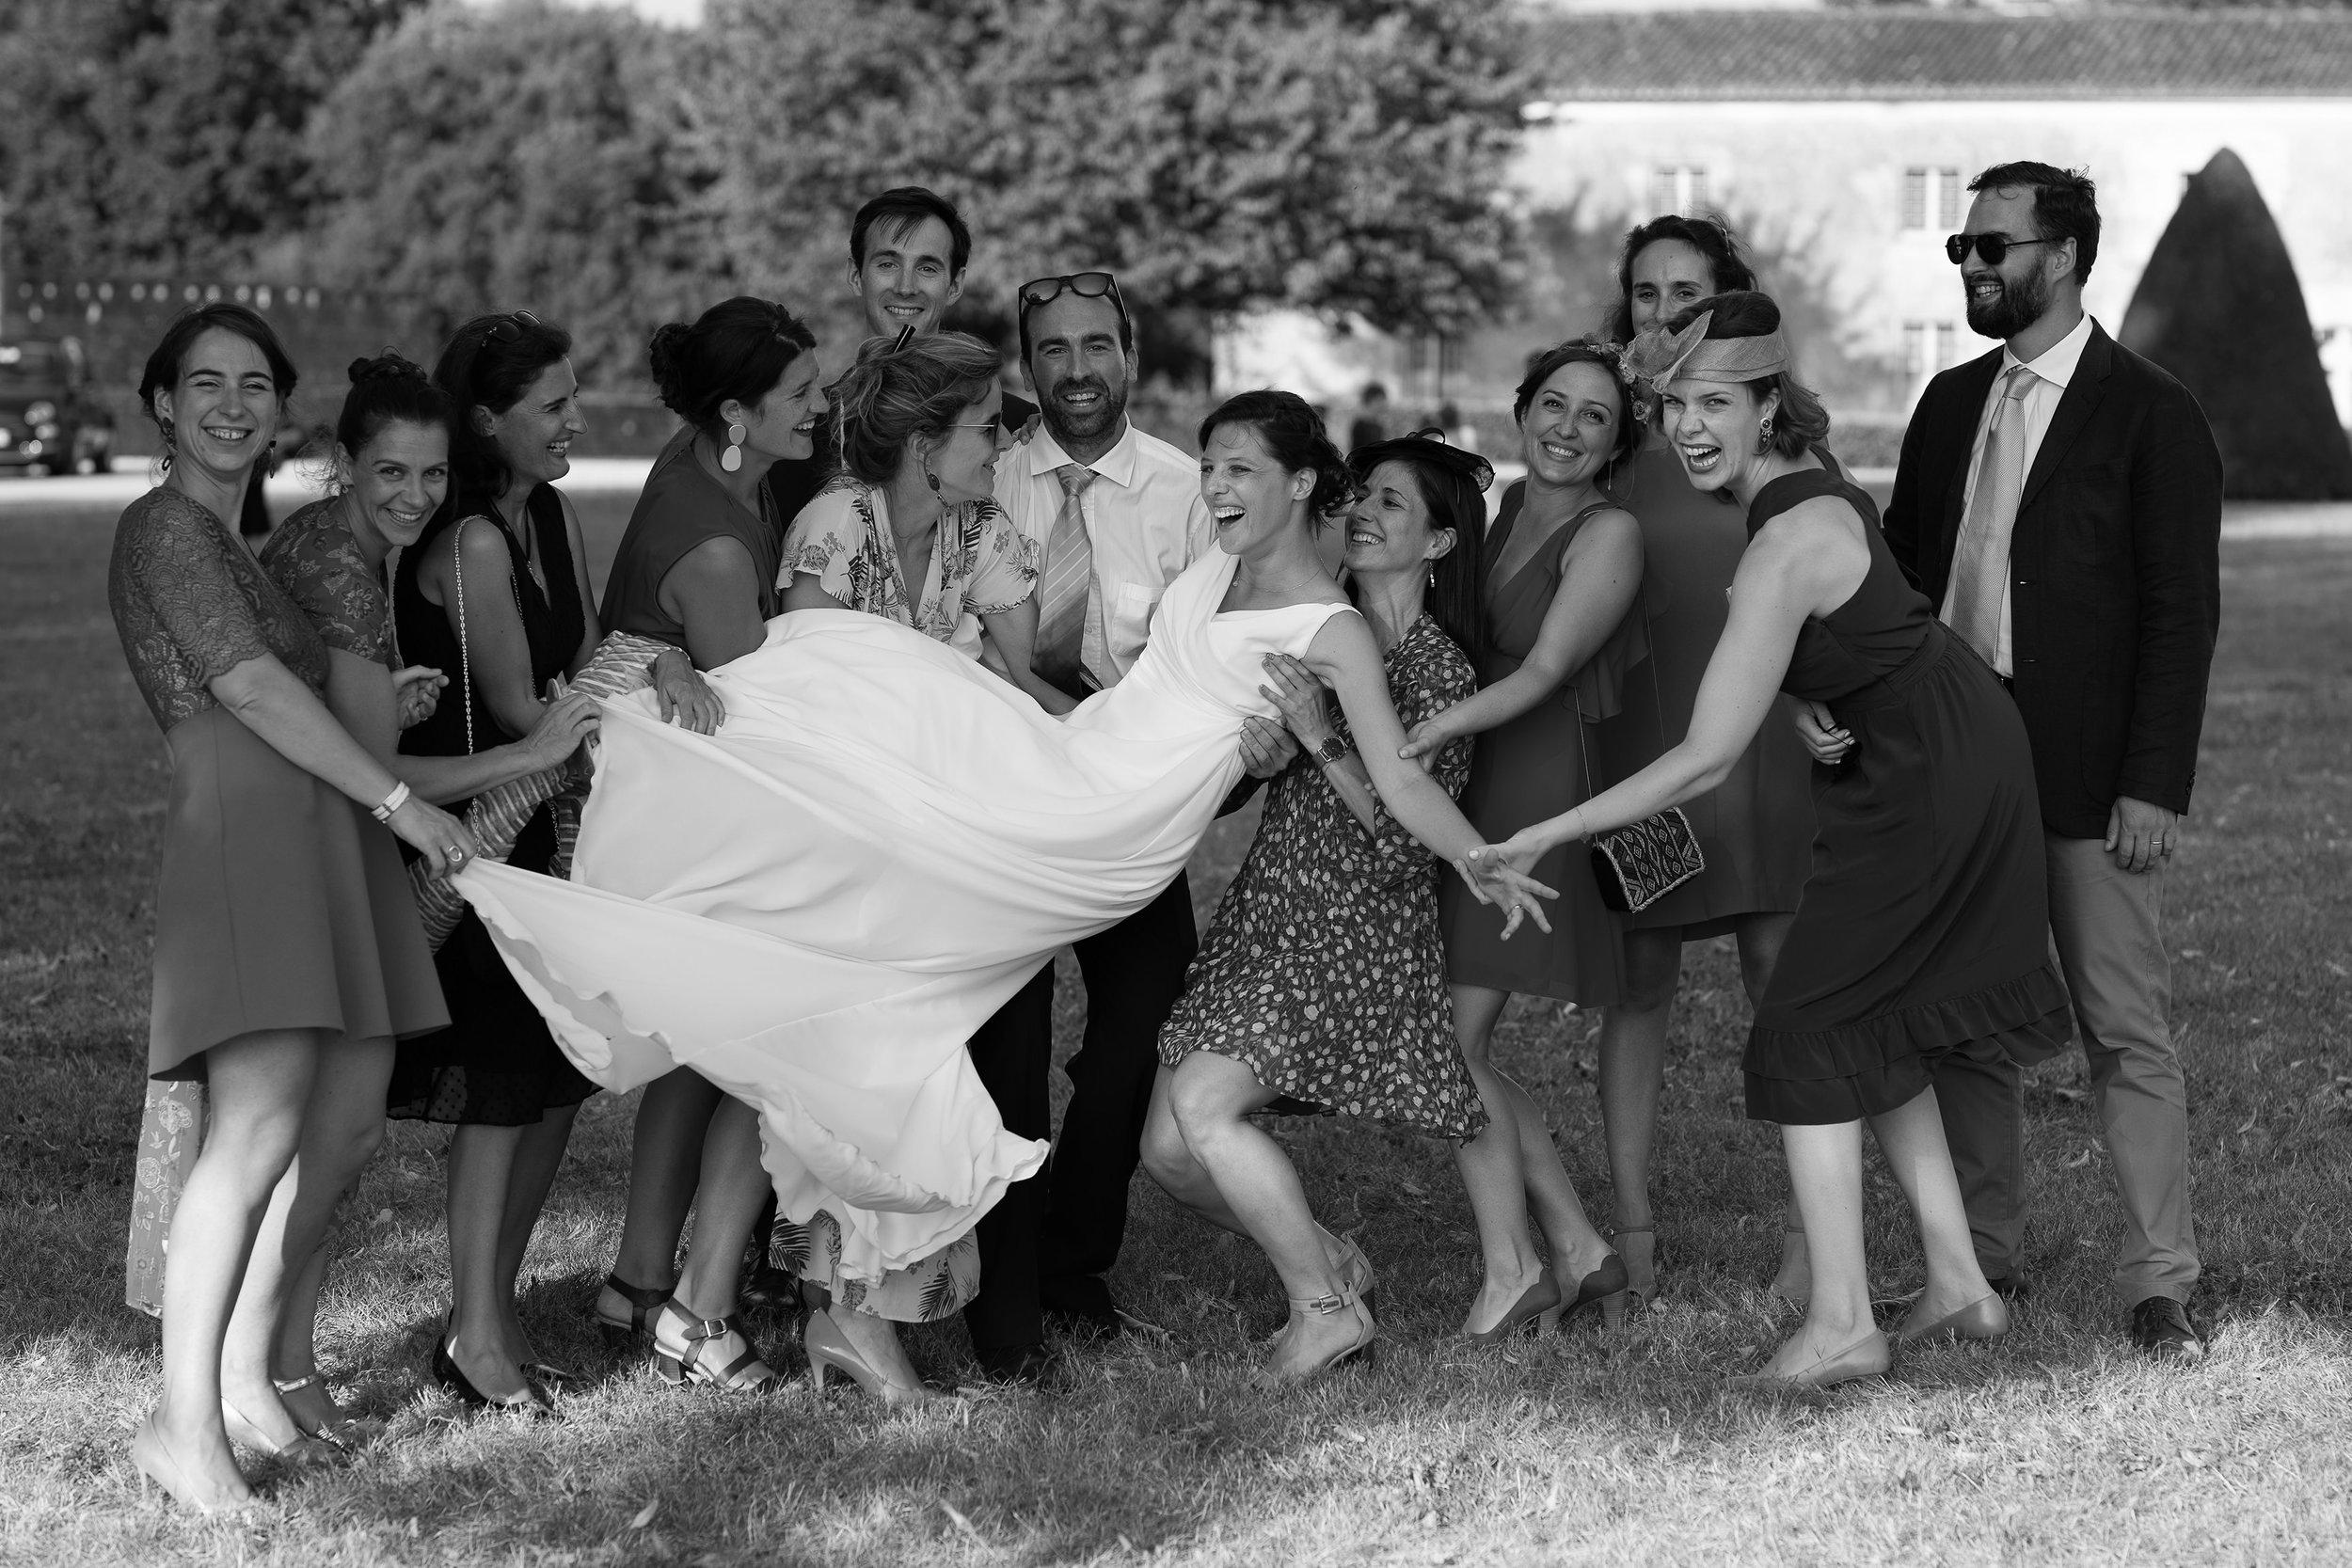 photographe-mariage-chateau-la-roche-courbon-334.jpg